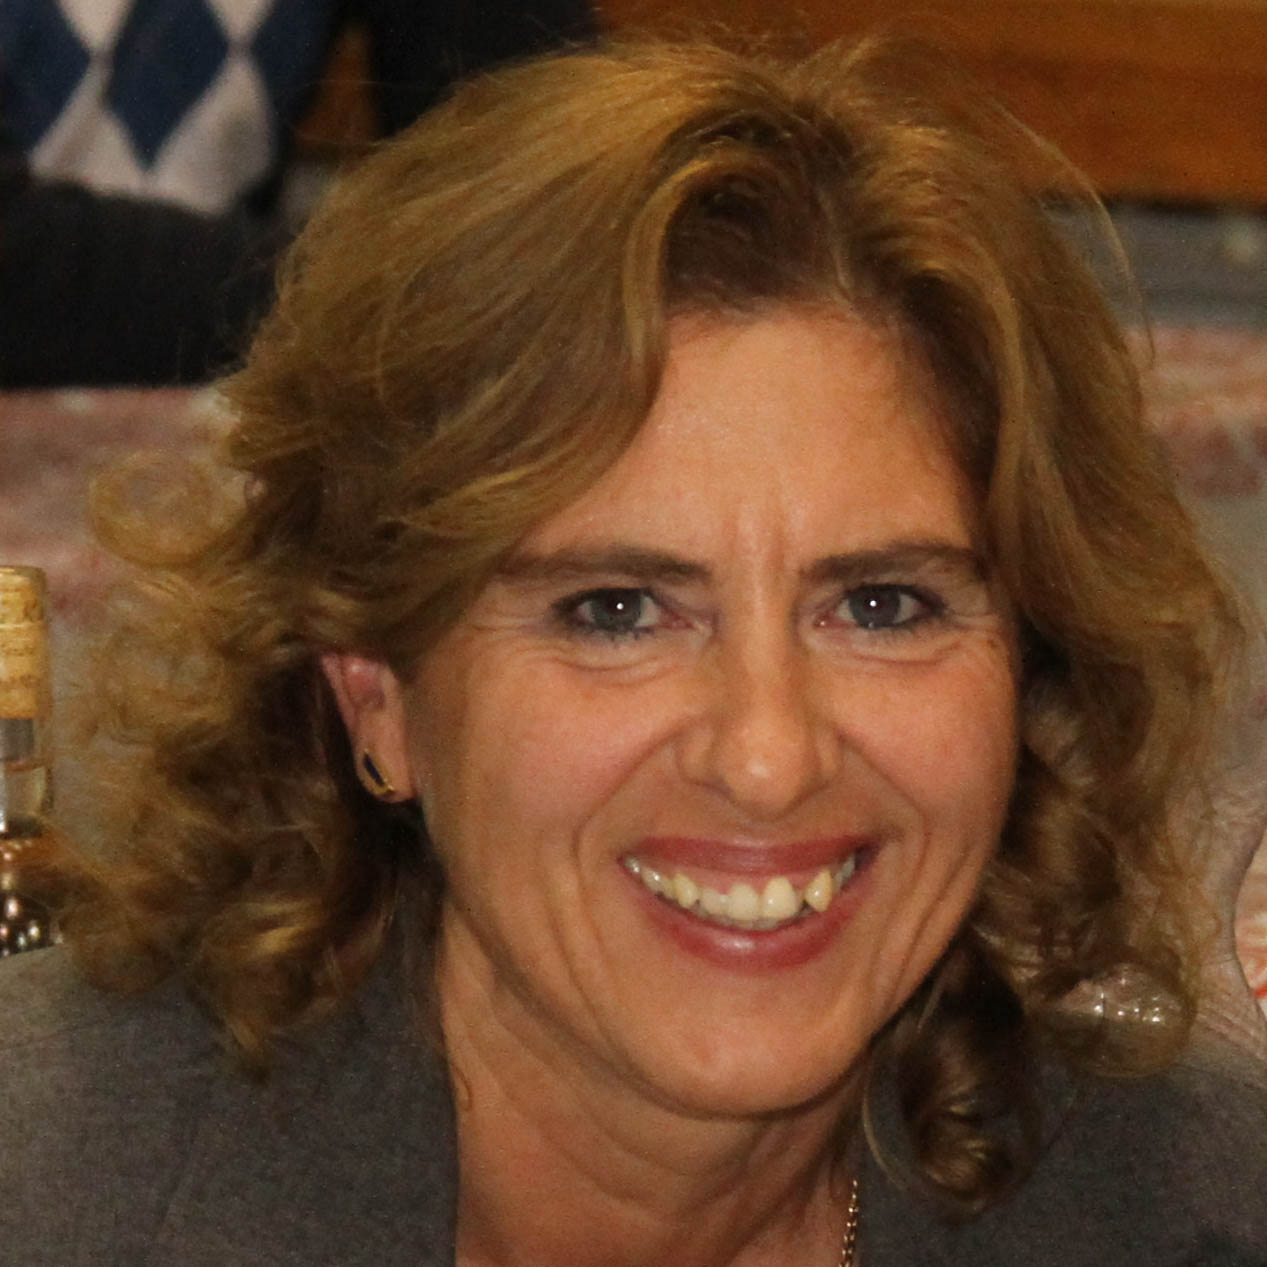 Biczó Anita